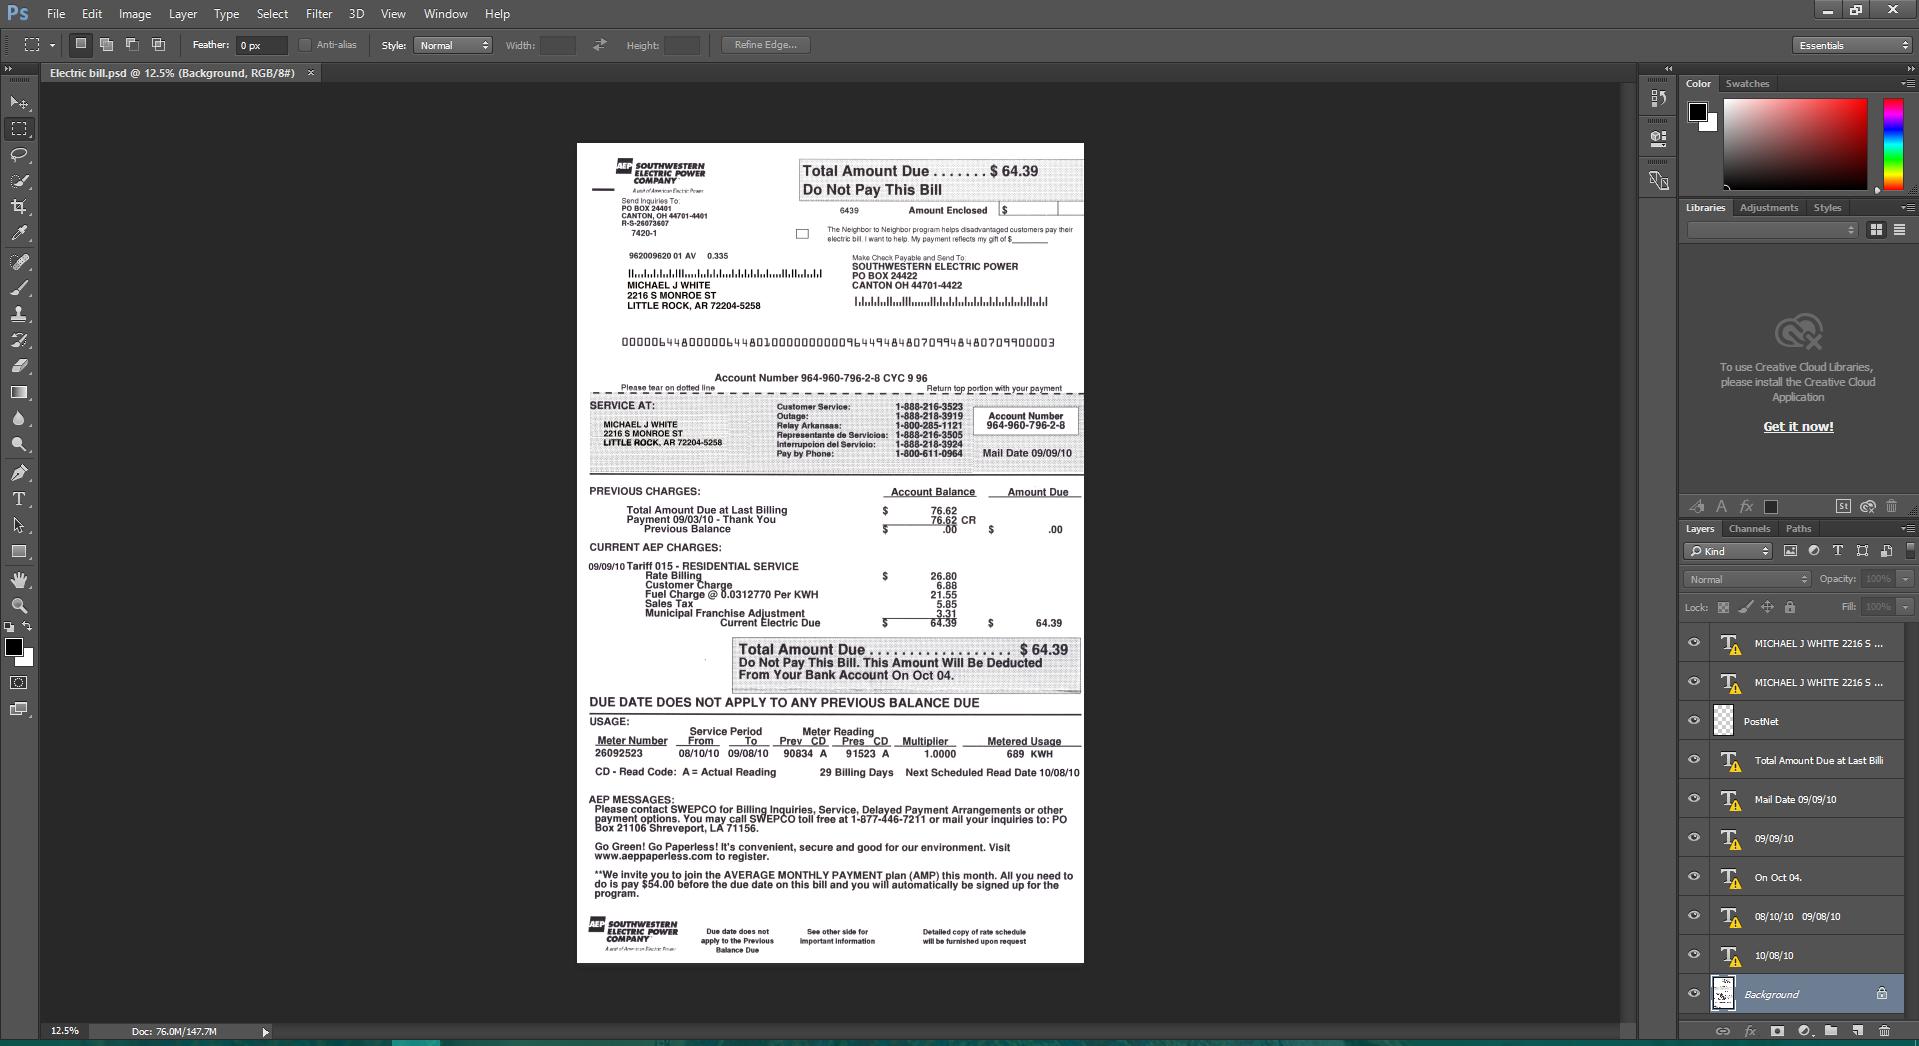 SouthWestern Electric Bill psd template